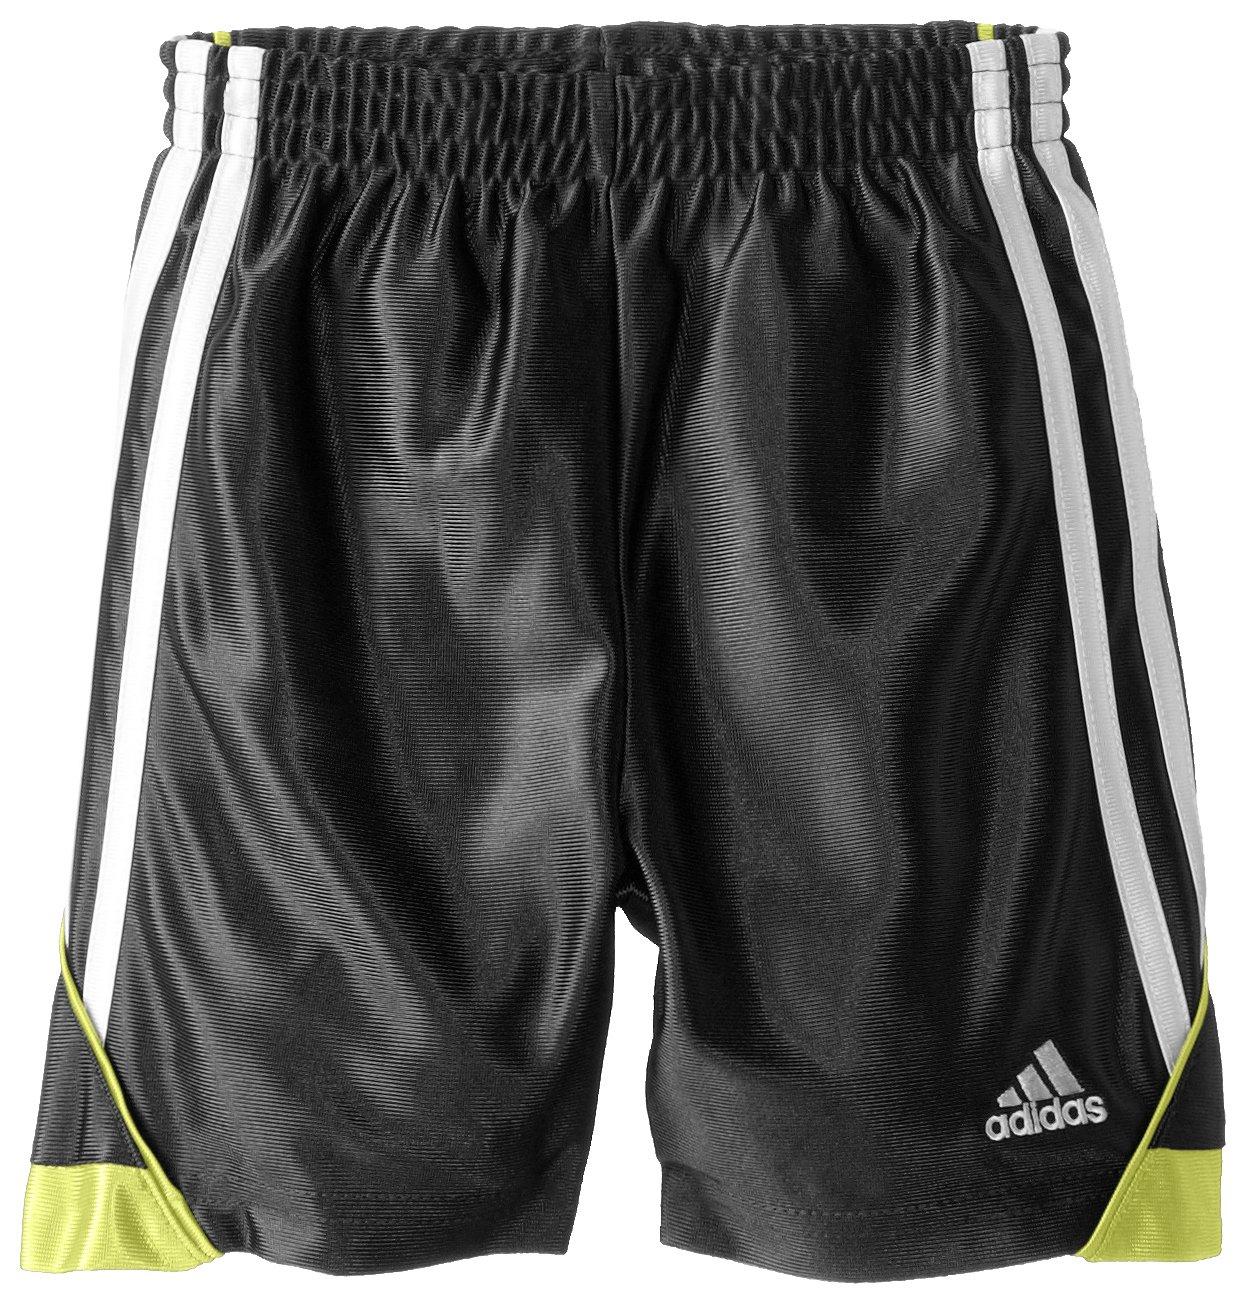 Adidas Little Boys' Speed Short, Black/Yellow, 4